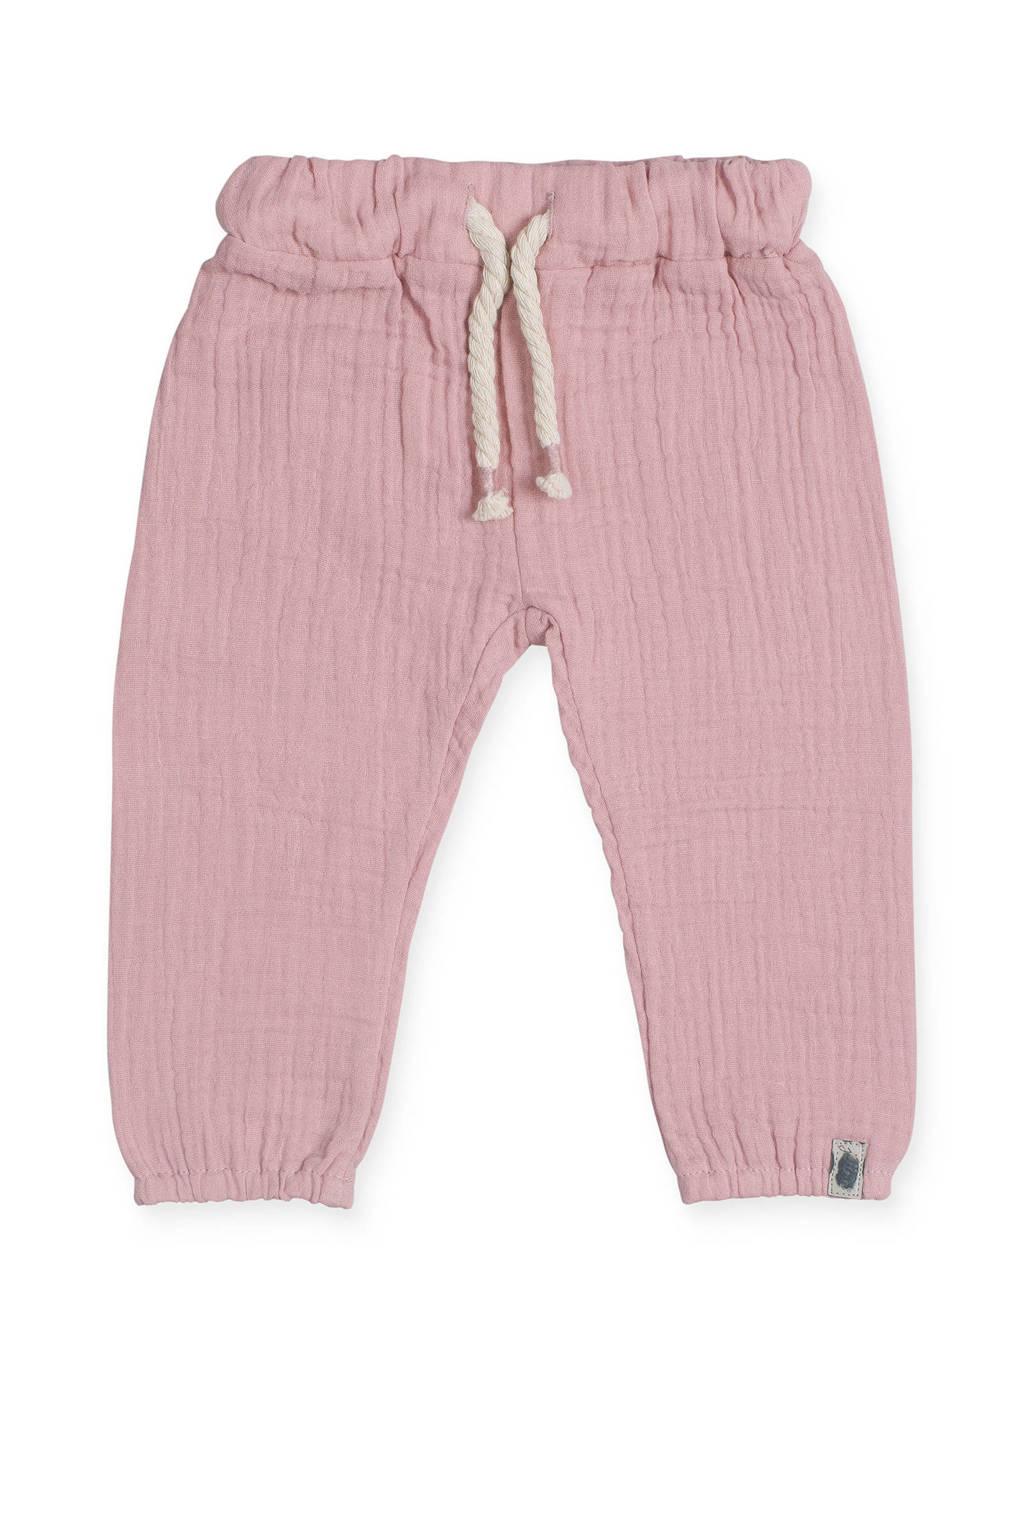 Jollein baby newborn broek roze, Roze